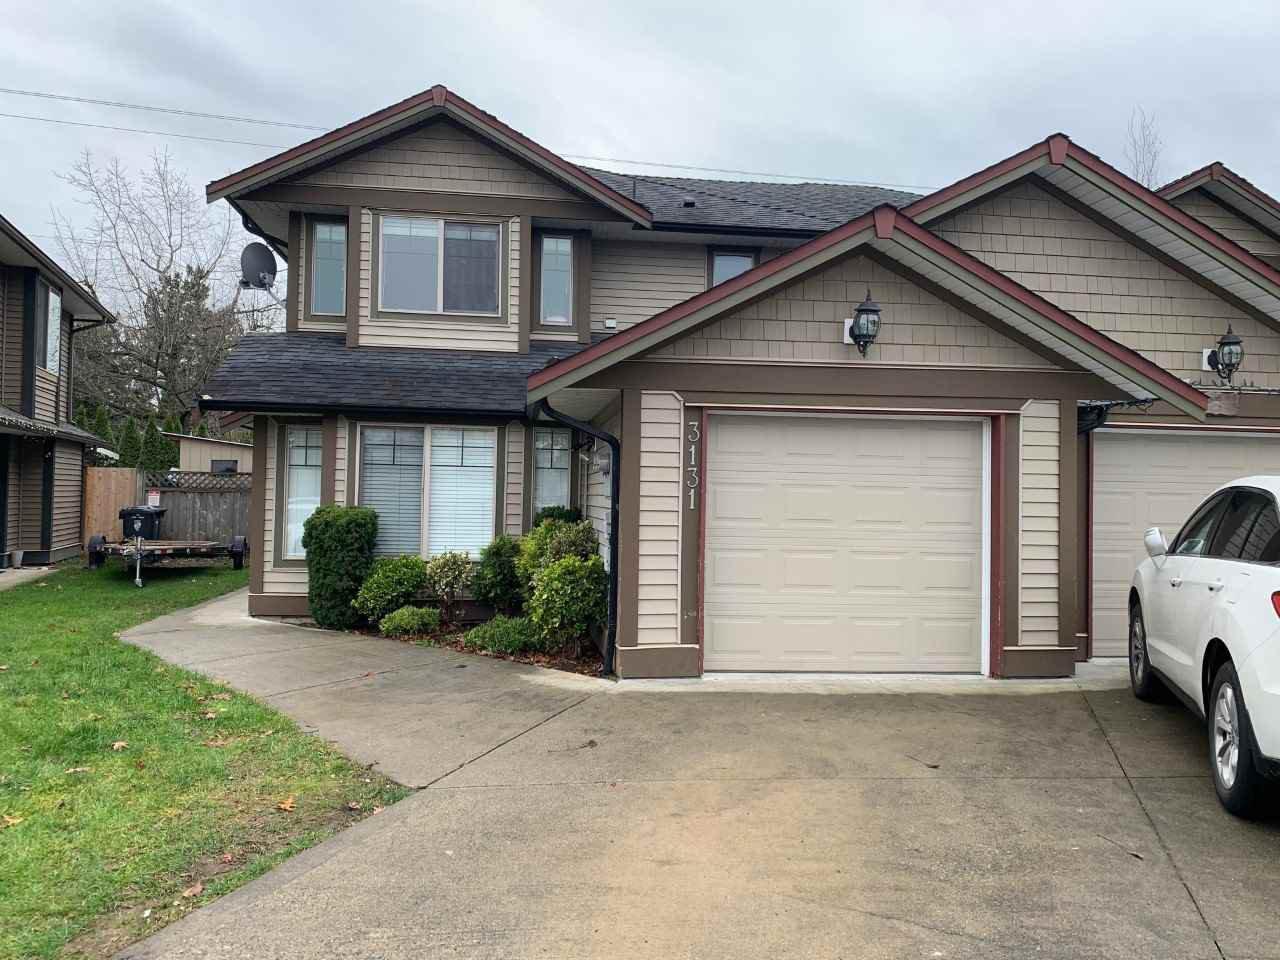 Main Photo: 3131 267A Street in Langley: Aldergrove Langley 1/2 Duplex for sale : MLS®# R2522123